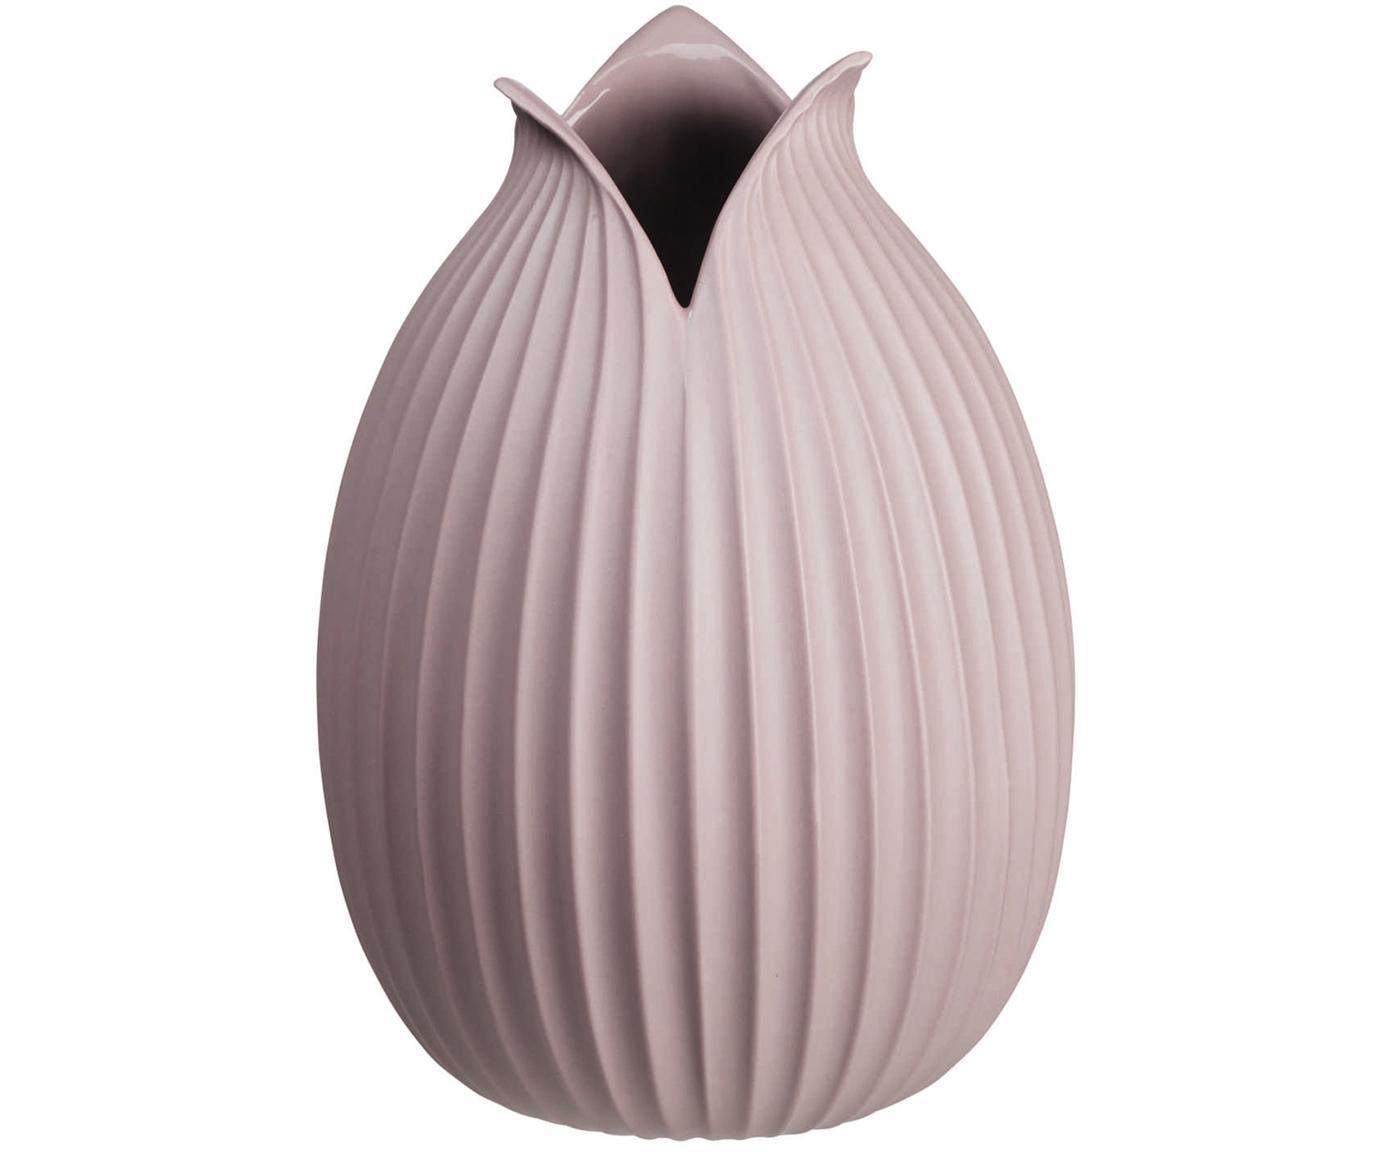 Jarrón artesanal de porcelana Yoko, Porcelana, Rosa, Ø 15 x Al 22 cm